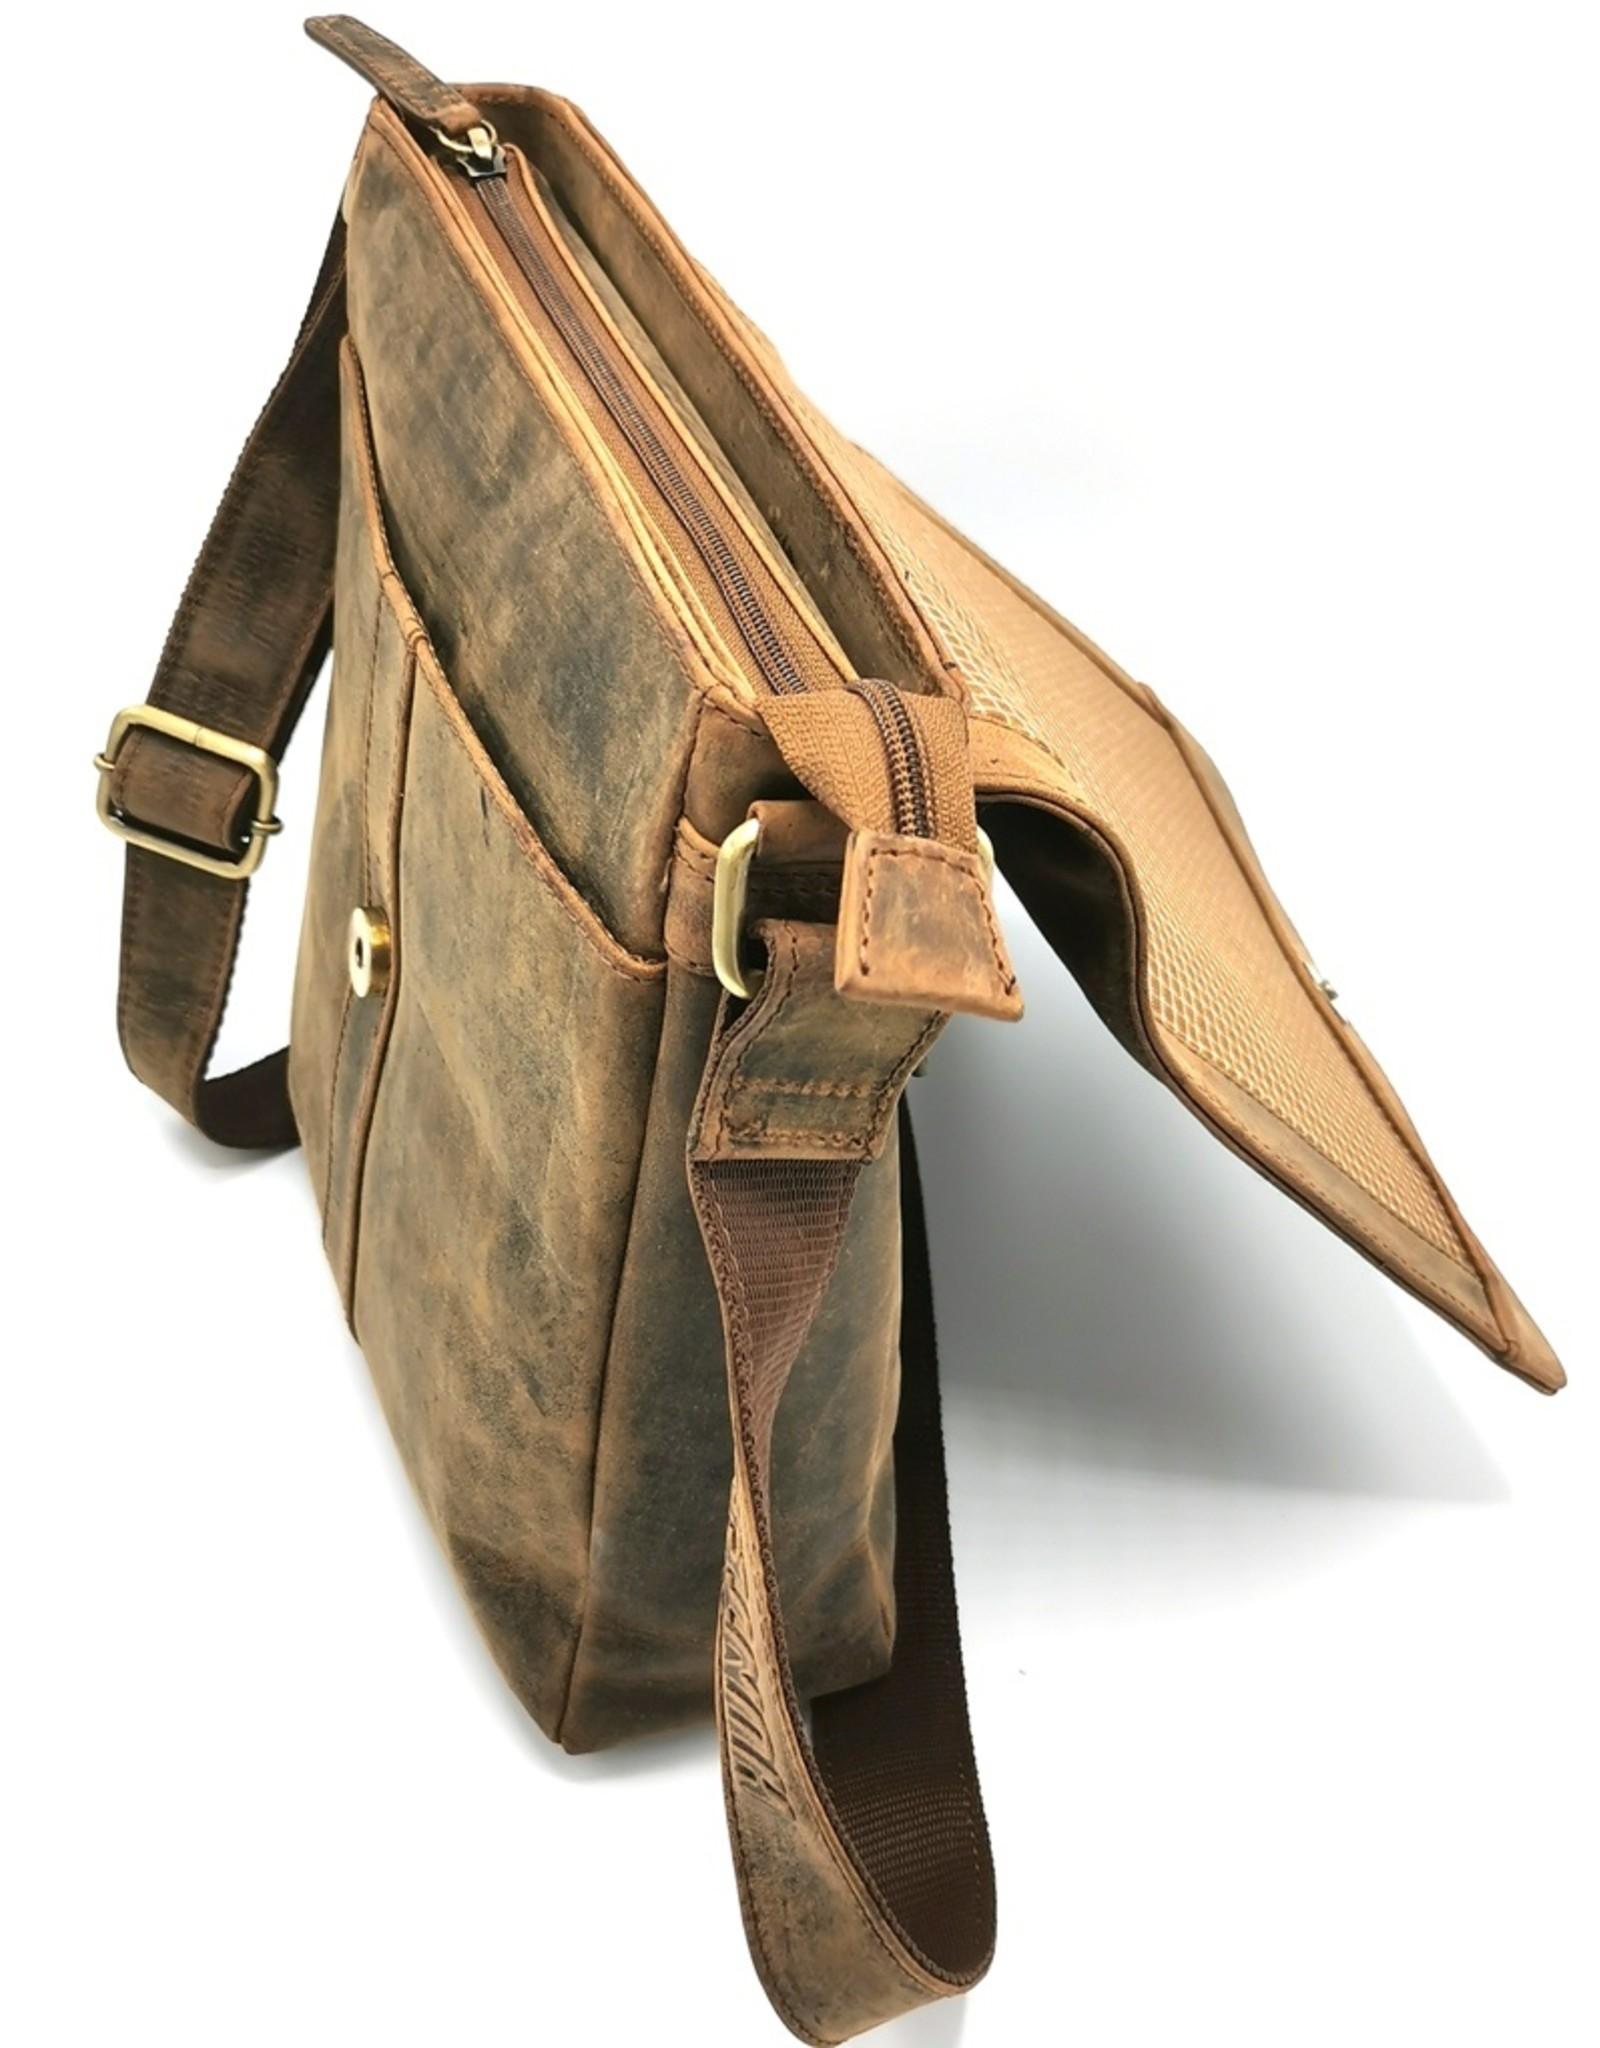 Hunters Leren schodertassen Leren crossbody tassen - Hunters Leren Crossbody tas Buffelleer (donker tan)